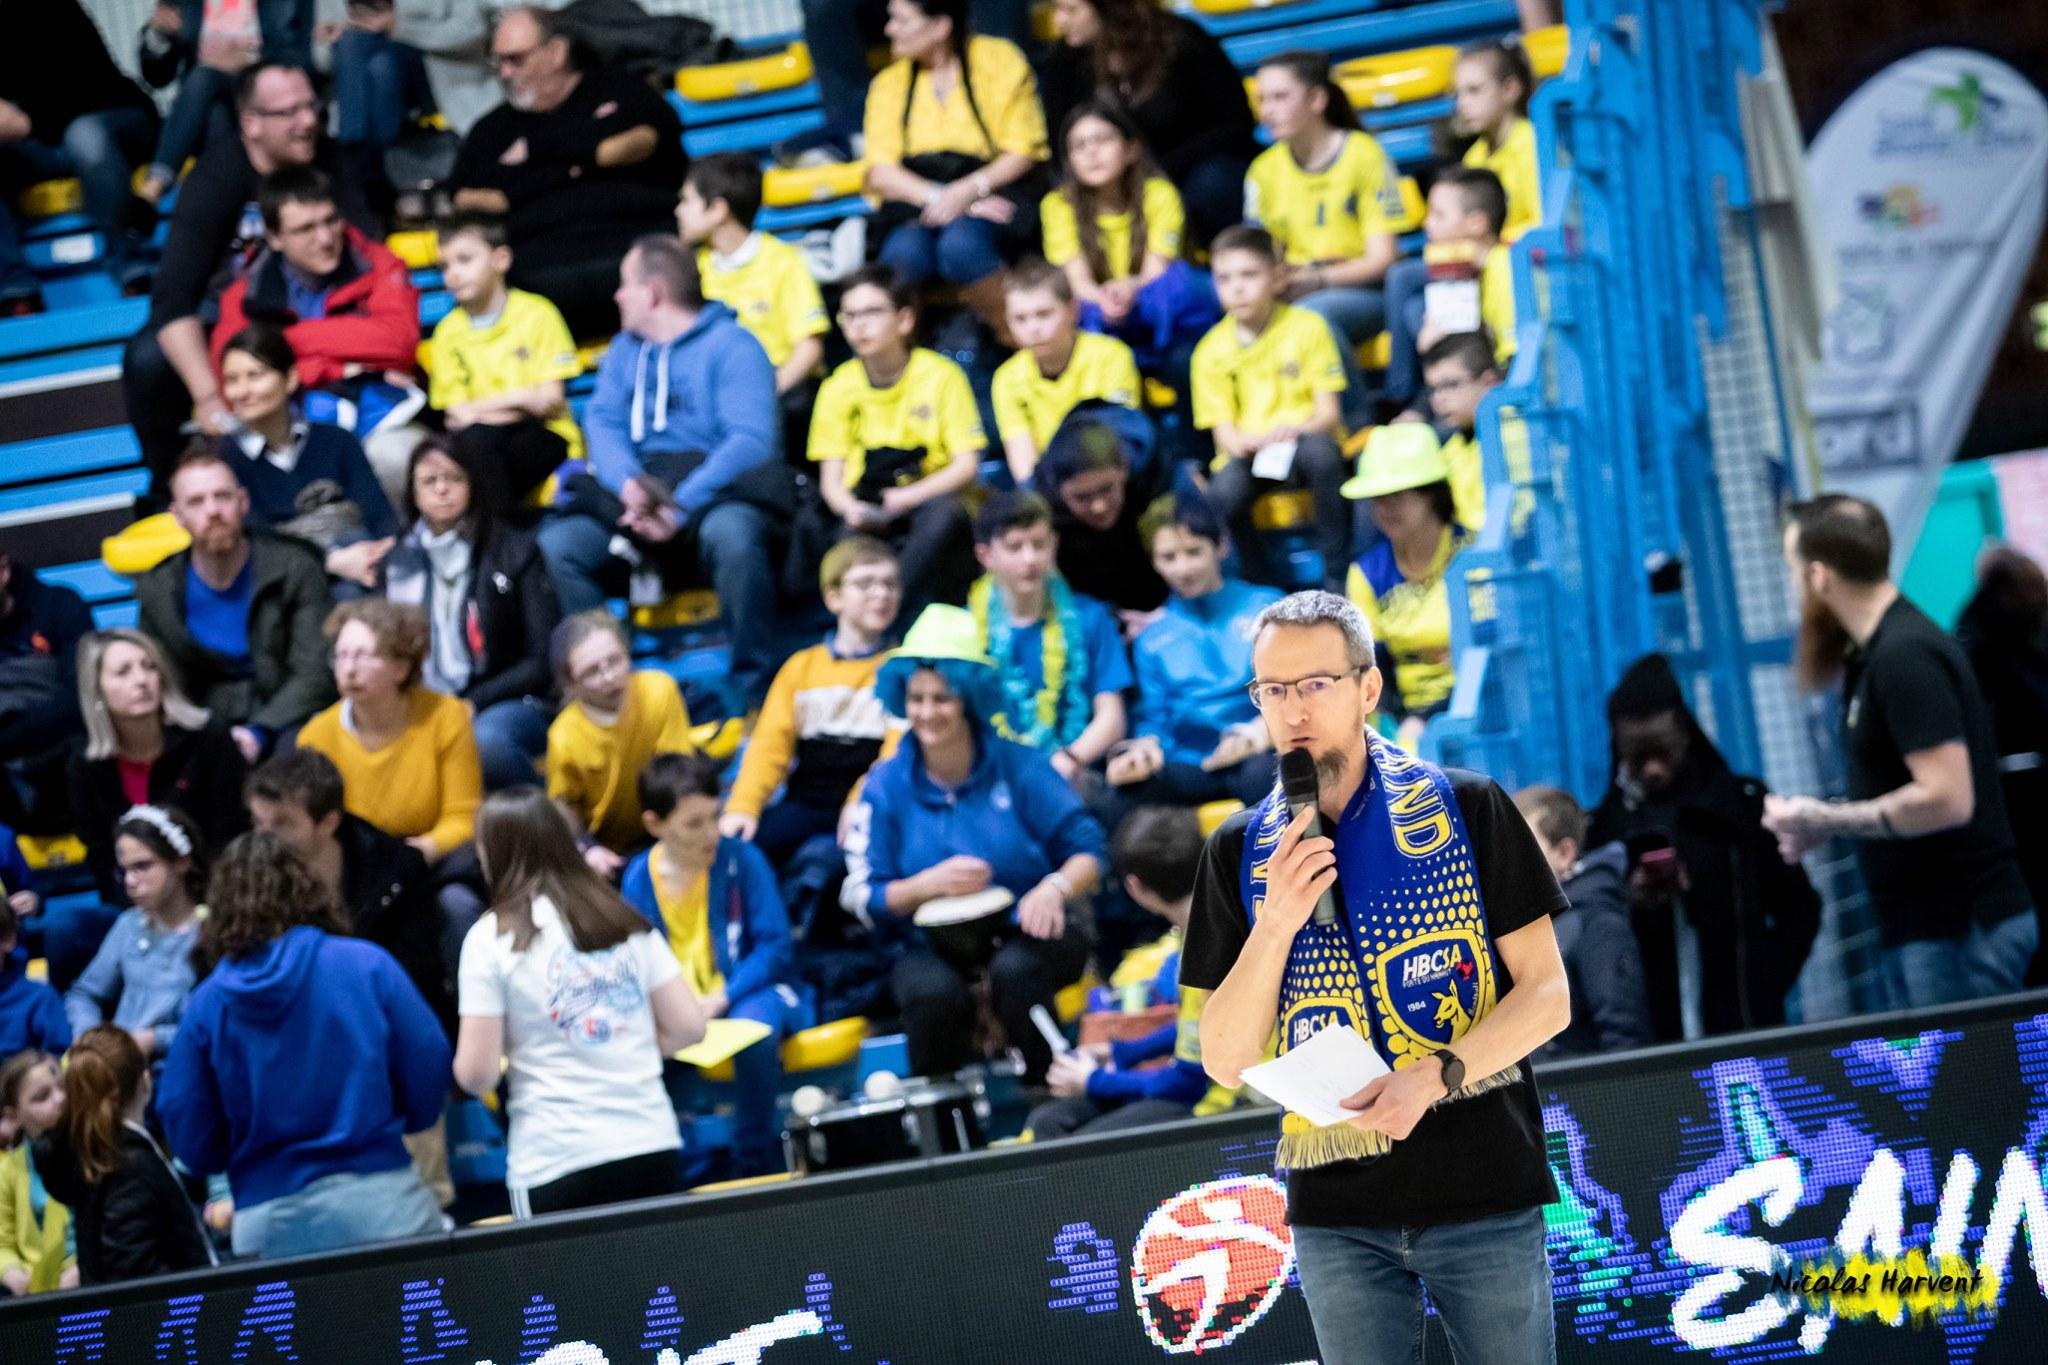 Les stats de la saison du Saint-Amand Handball